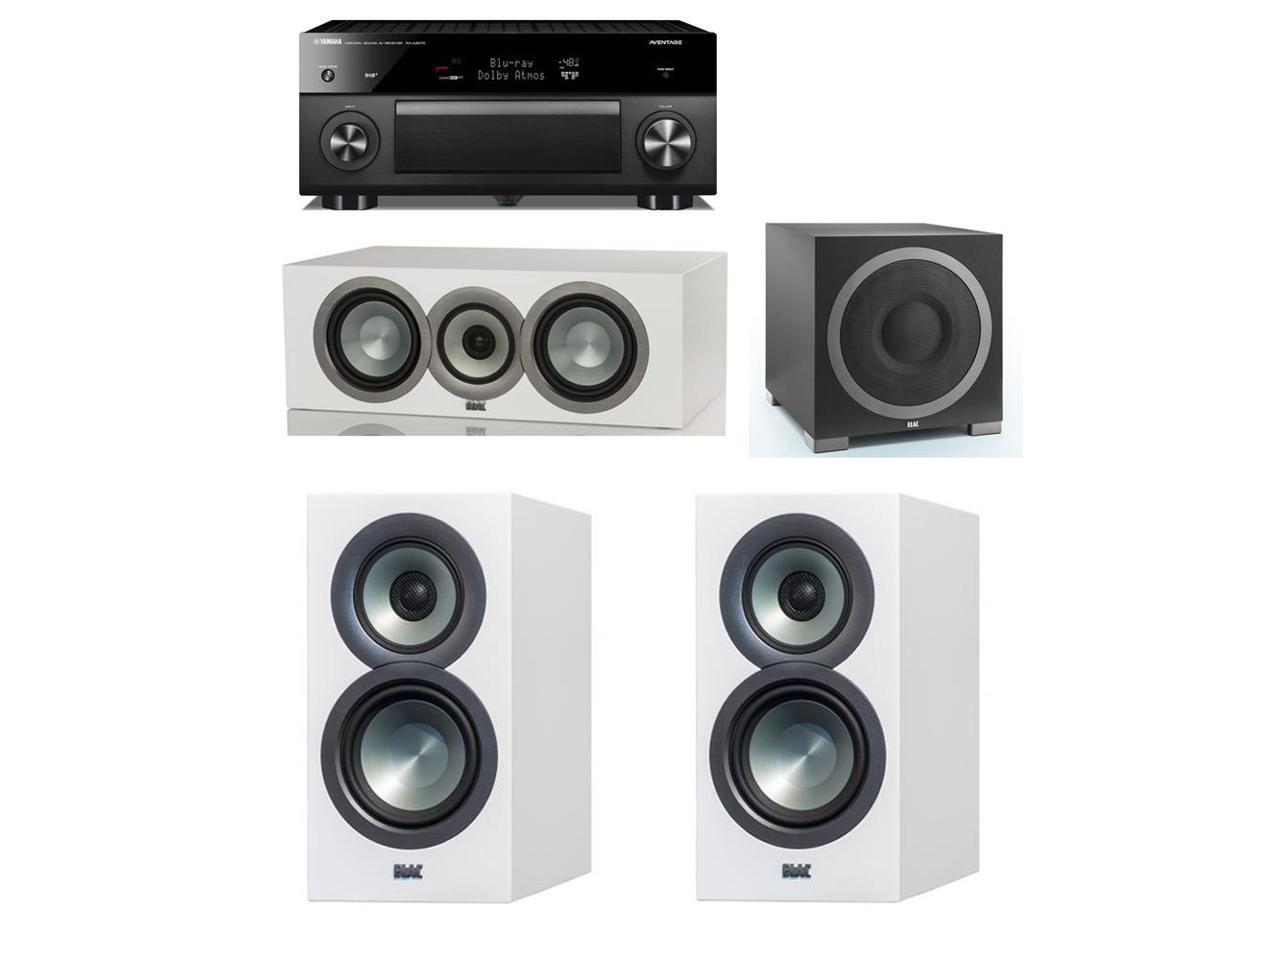 ELAC Uni-Fi Slim White 3.1 System with 2 ELAC BS-U5 Bookshelf Speakers, 1 ELAC CC-U5 Center Speaker, 1 ELAC Debut S12EQ Powered Subwoofer, 1 Yamaha RX-A3070 Receiver